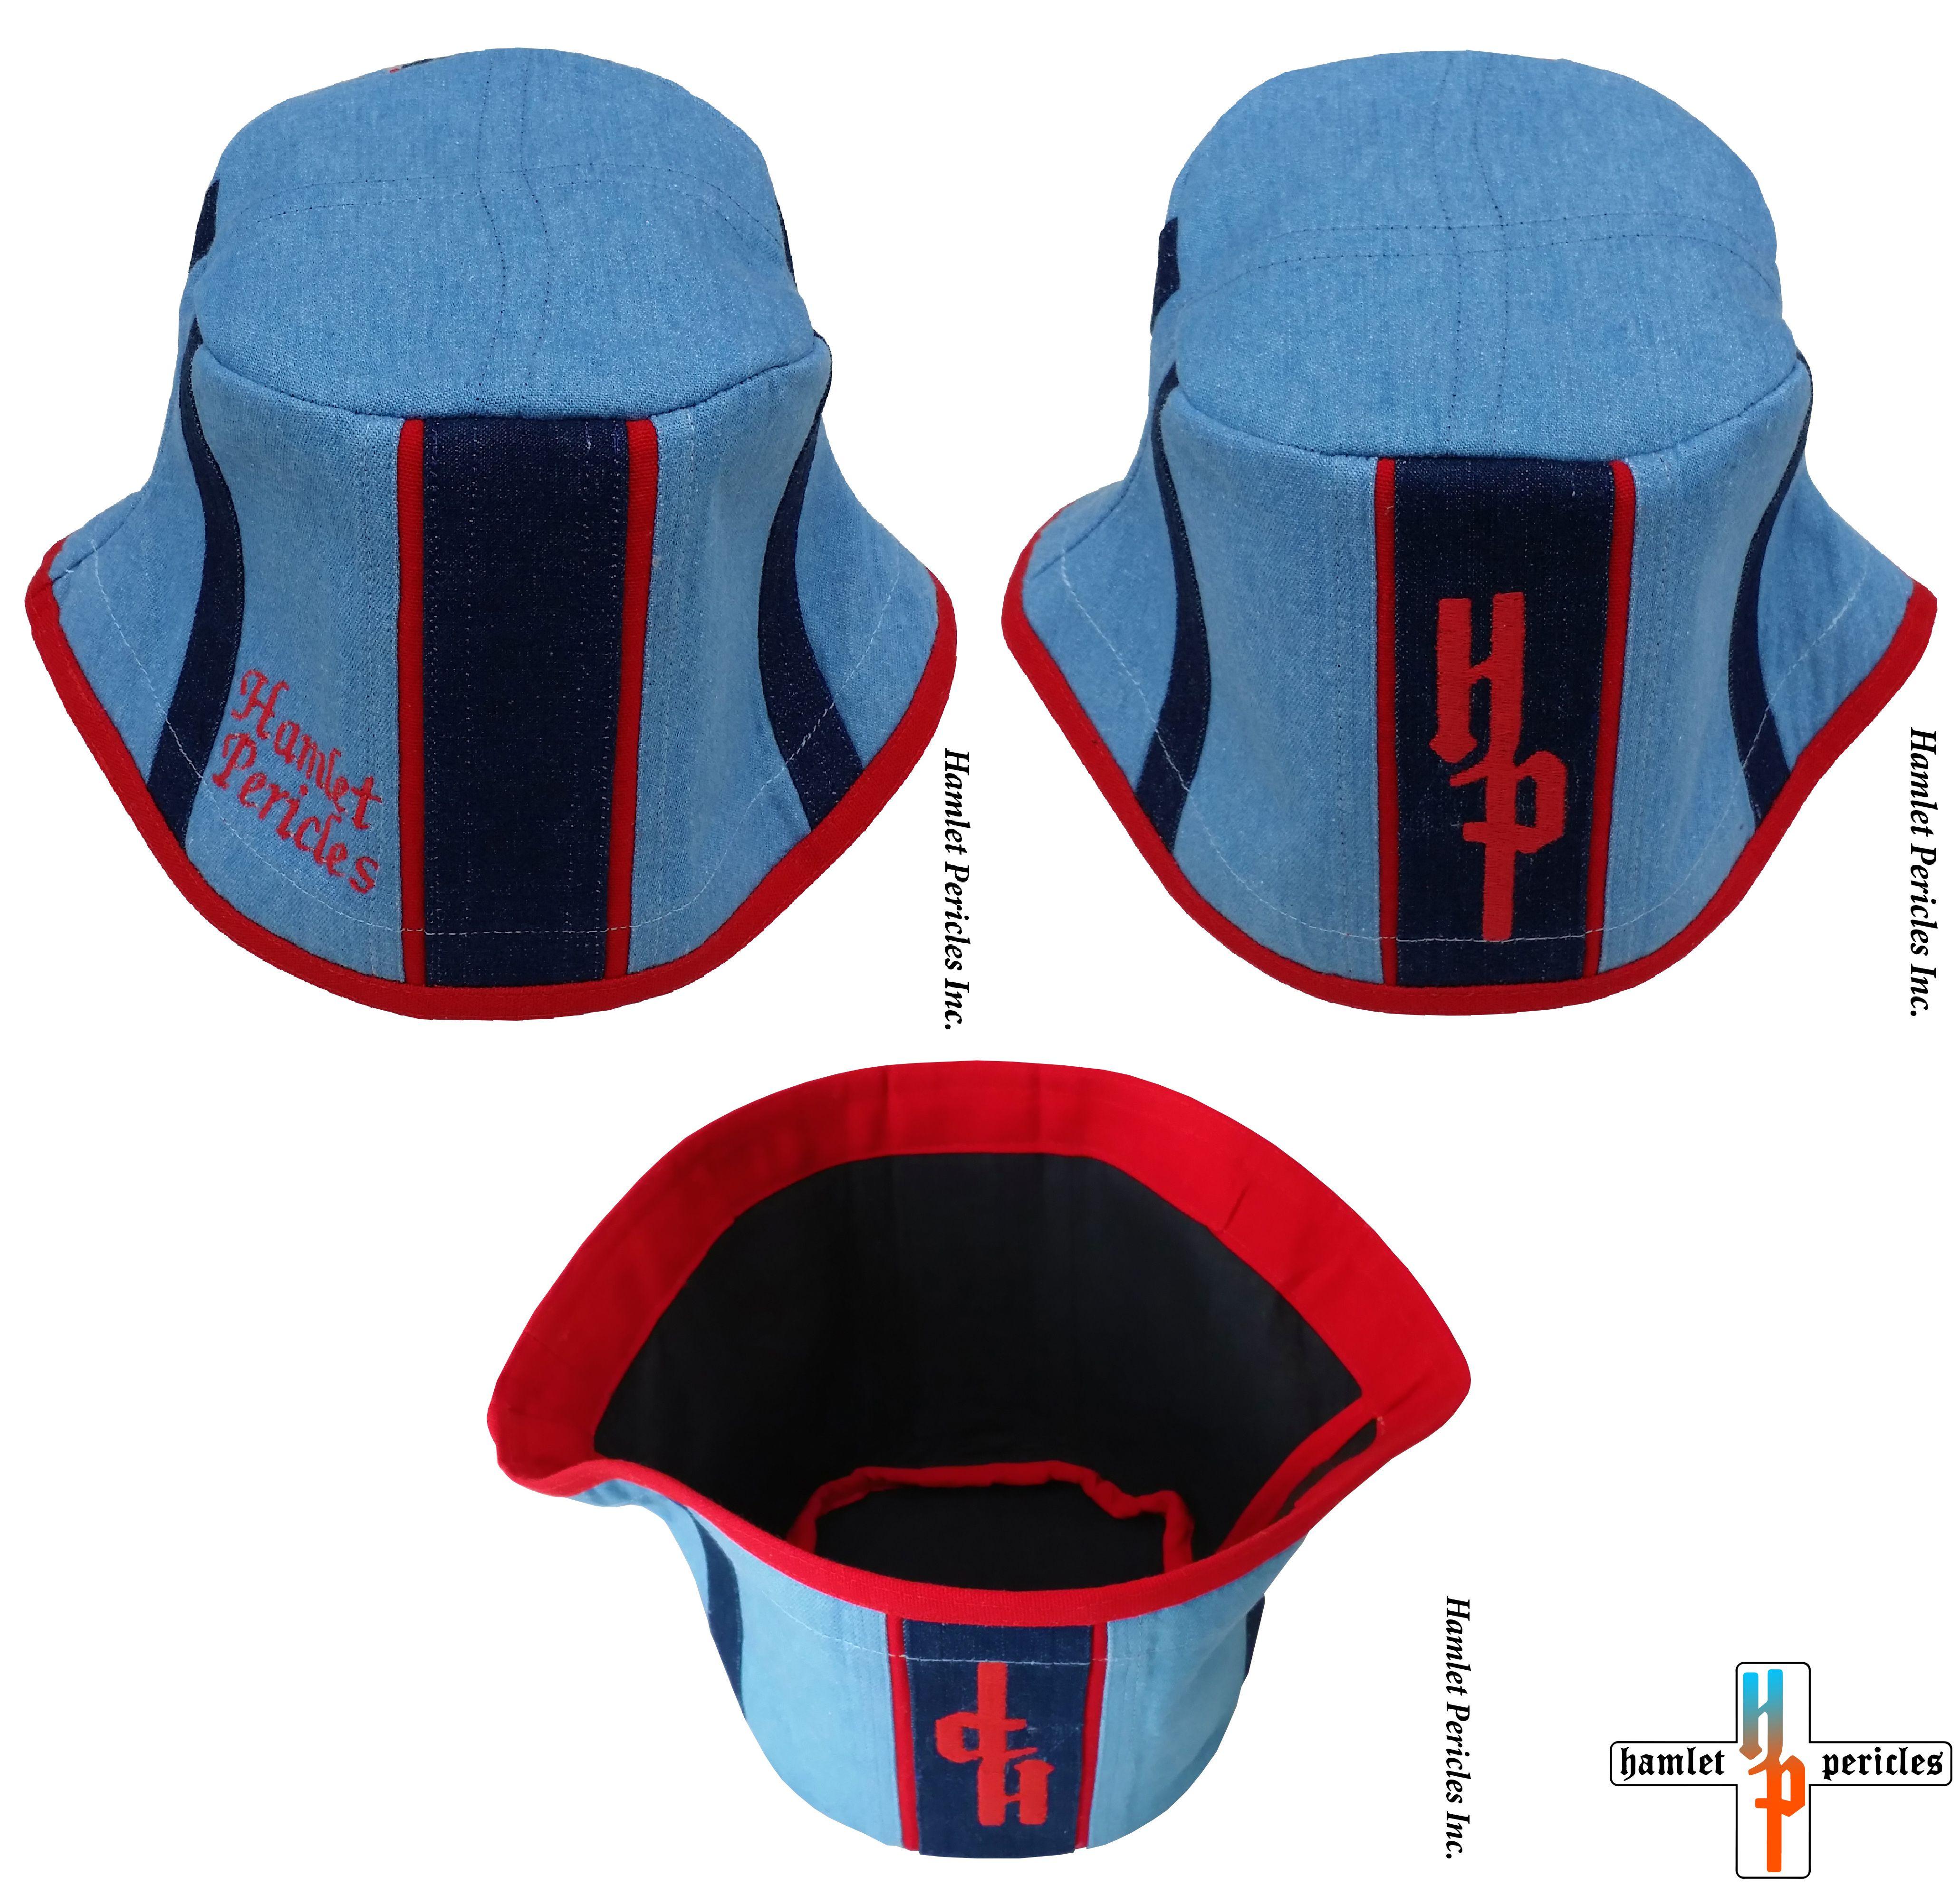 111e52fd Sky Blue Denim + Navy Denim + Red Duck Cotton Bucket Hat via Hamlet Pericles,  Inc.   #Hamlet #Pericles #BucketHat #SkyBlue #SkyBlueDenim #BlueDenim  #Denim ...